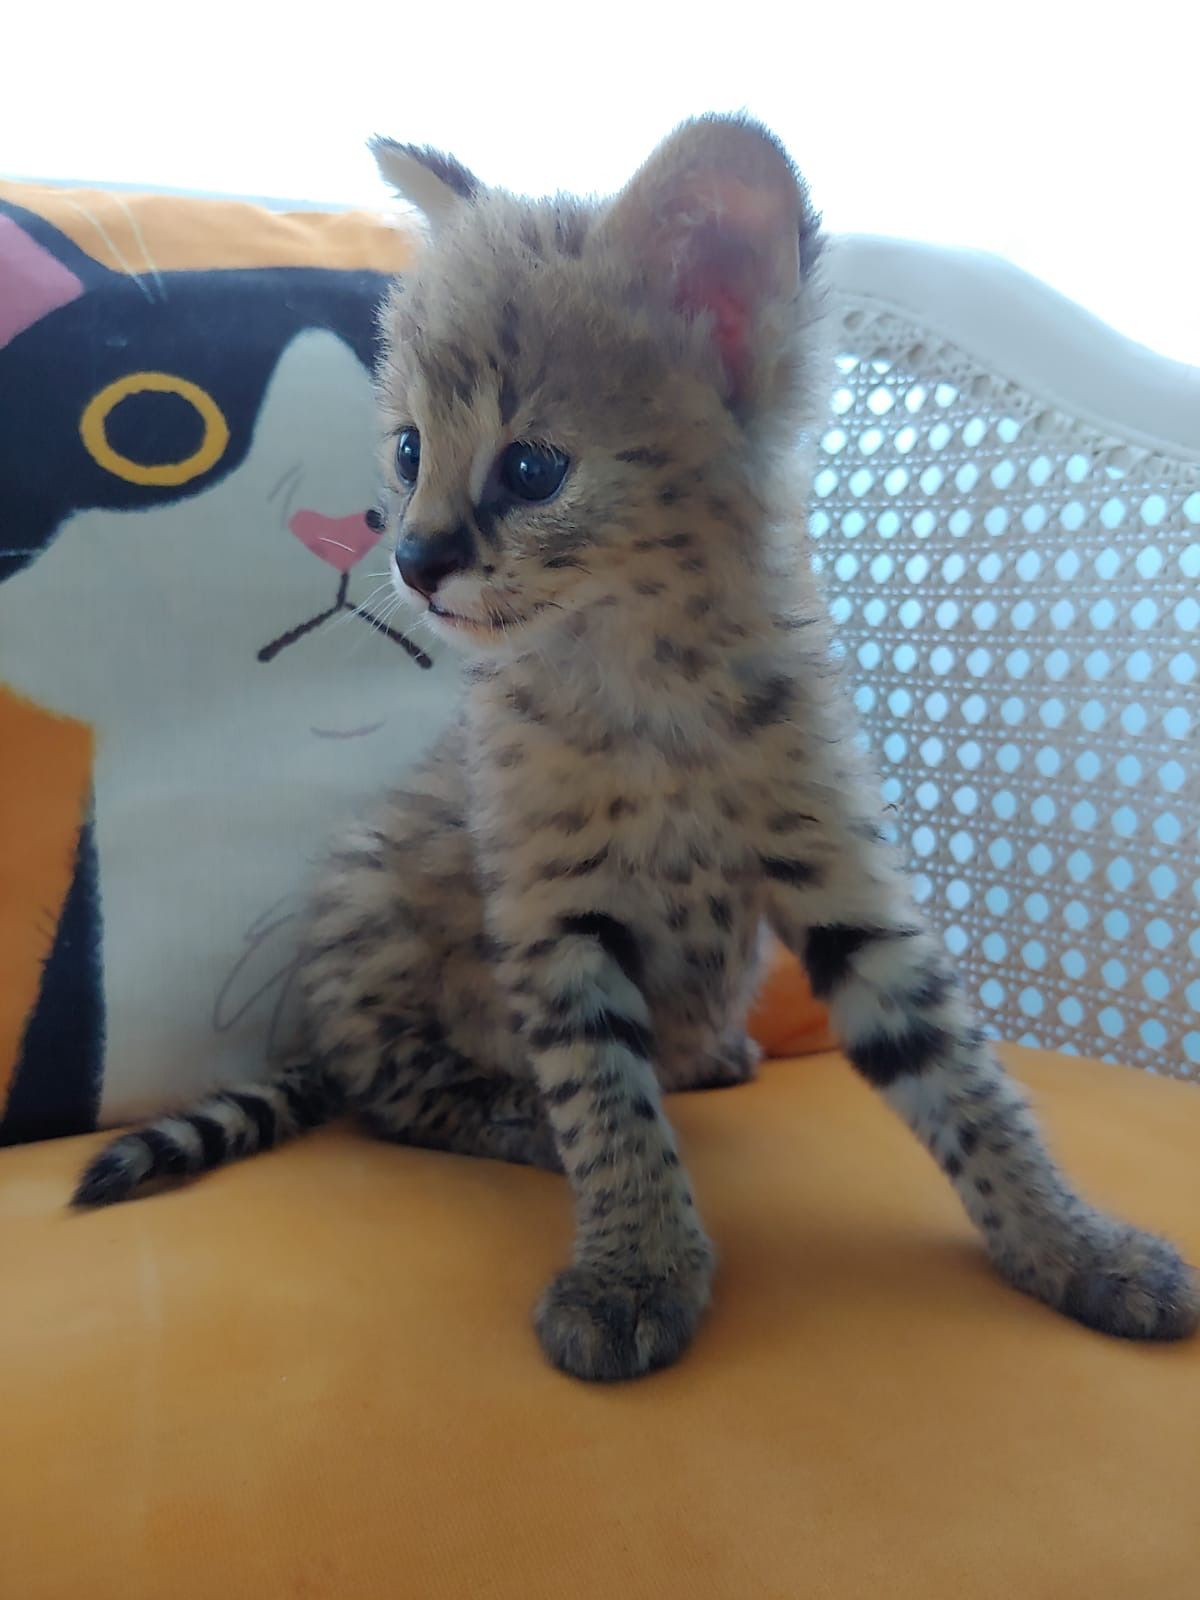 F1 Savannah Kitten For Sale F1 Savannah Cat For Sale F1 Savannah